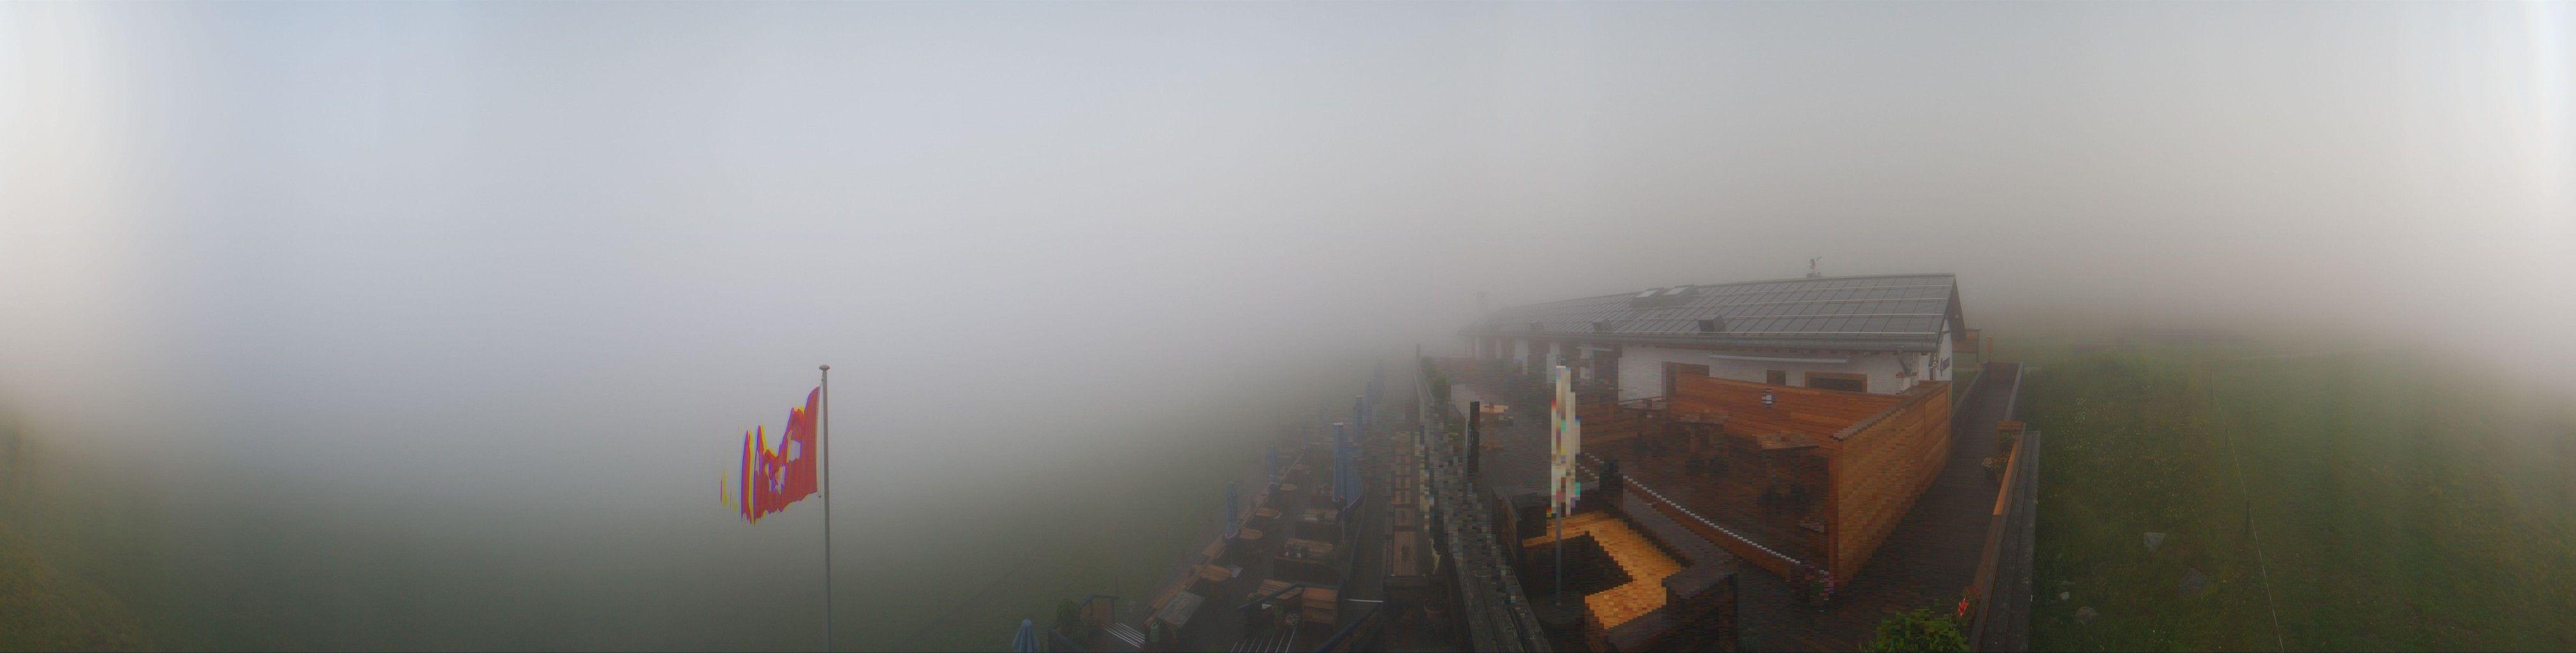 Sankt Moritz: St Moritz - Piz Albana